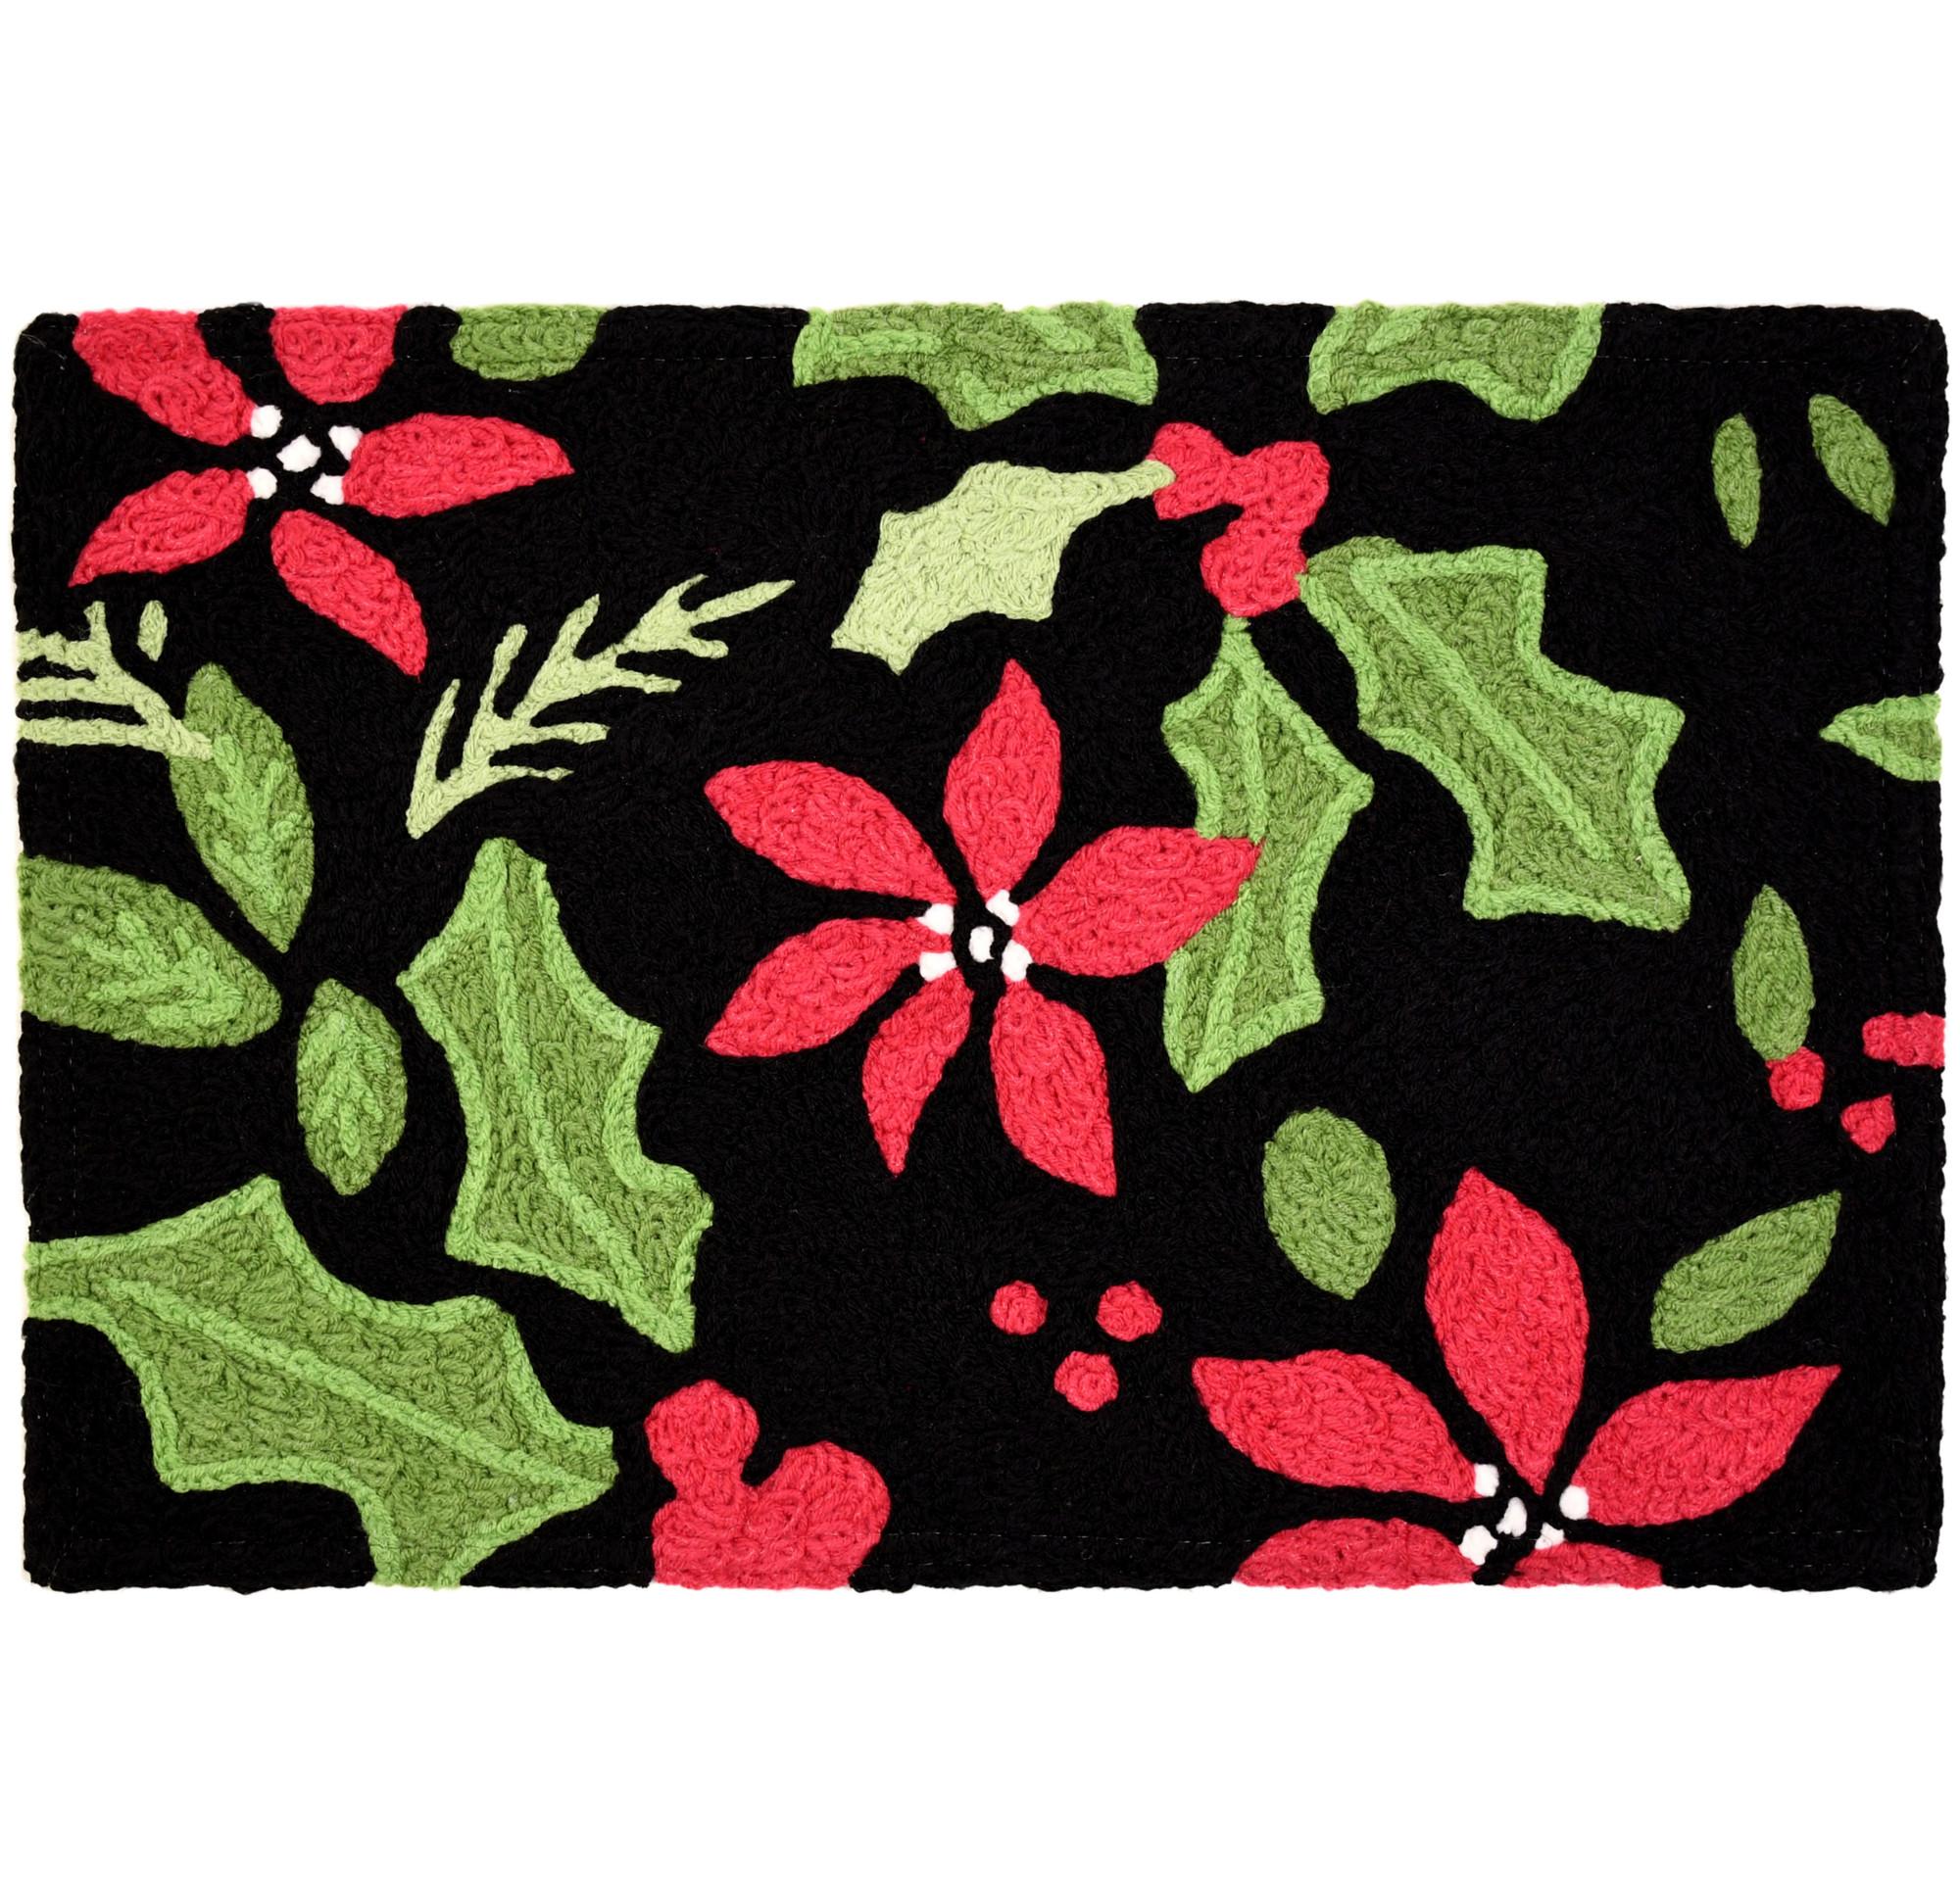 Poinsettia & Holly Toss Christmas Rug Red & Green Floral Rug 20 x 30 Jellybean Accent Rug